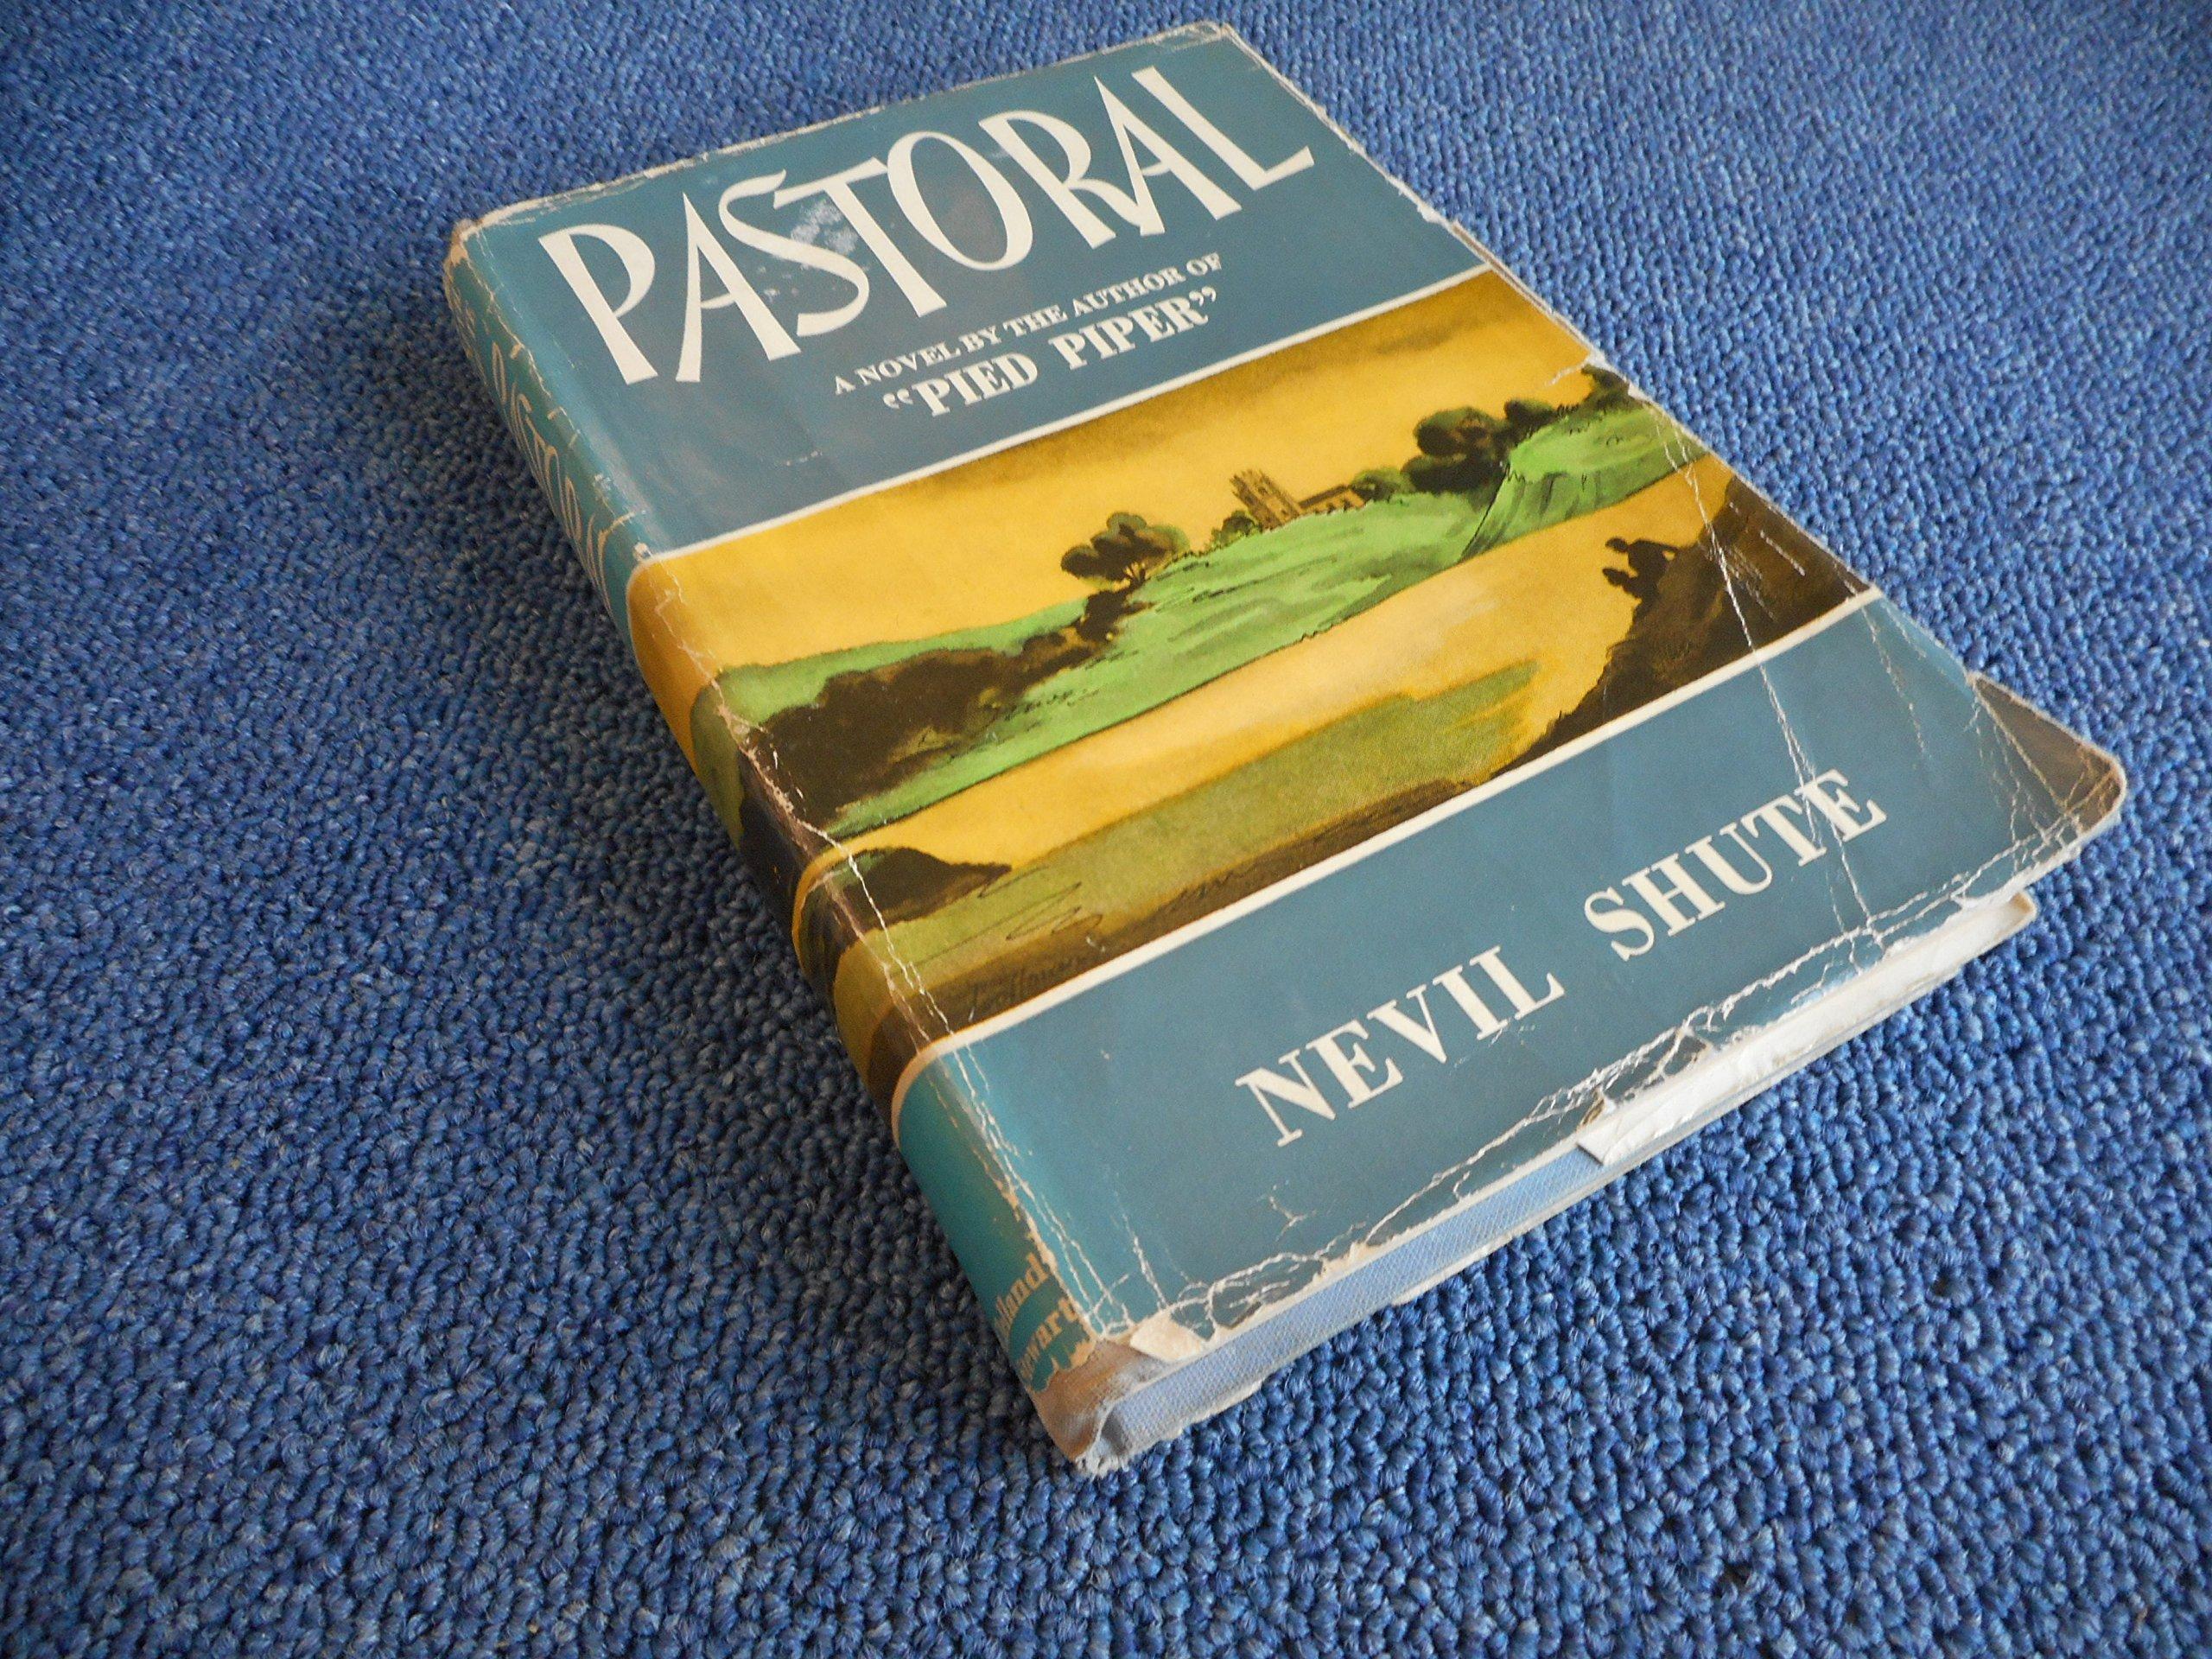 pastoral shute nevil